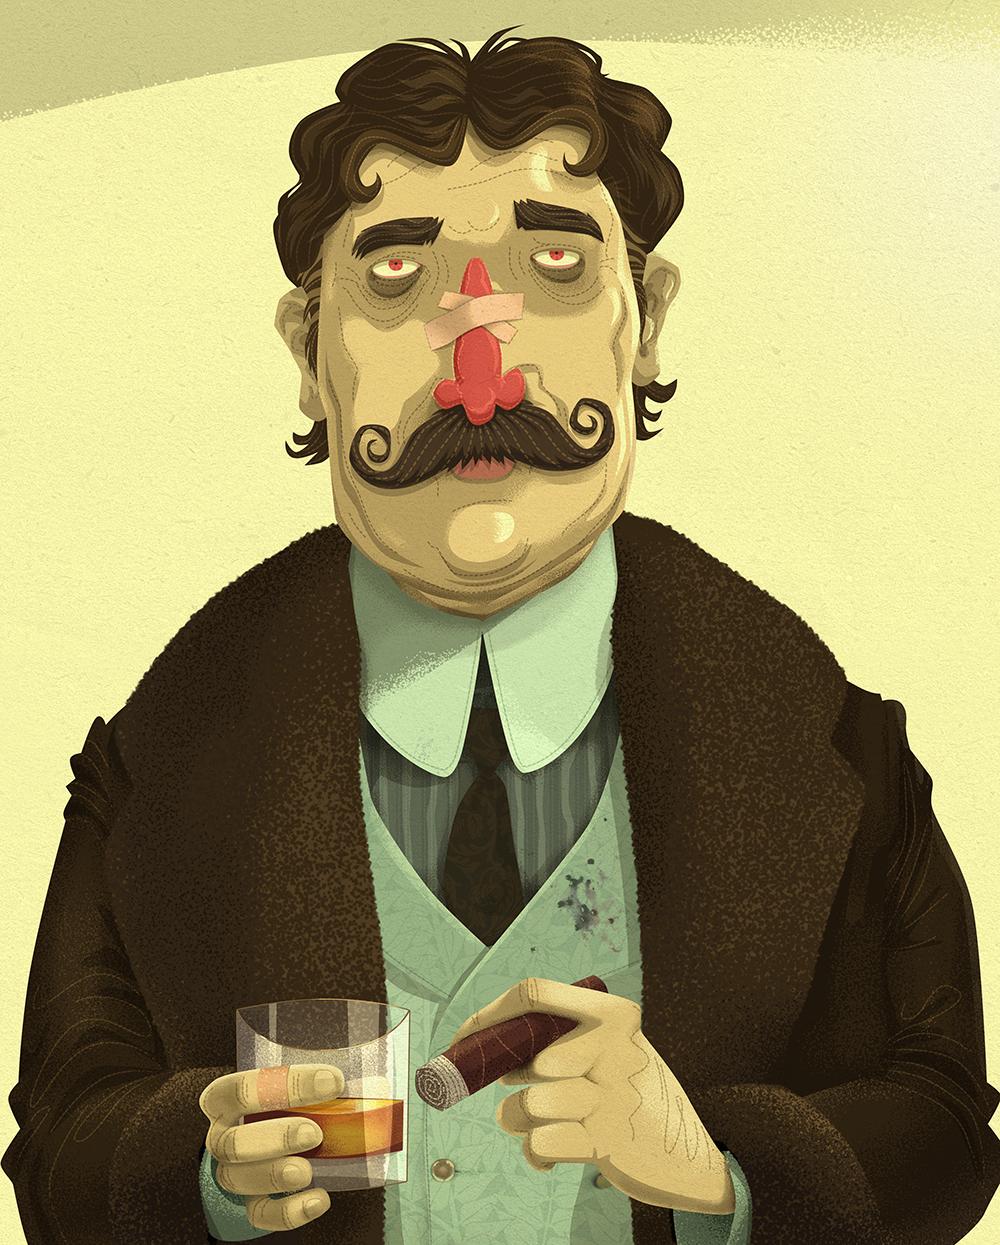 cigar_characters_steve_simpson_cigarmonkeys_3.jpg